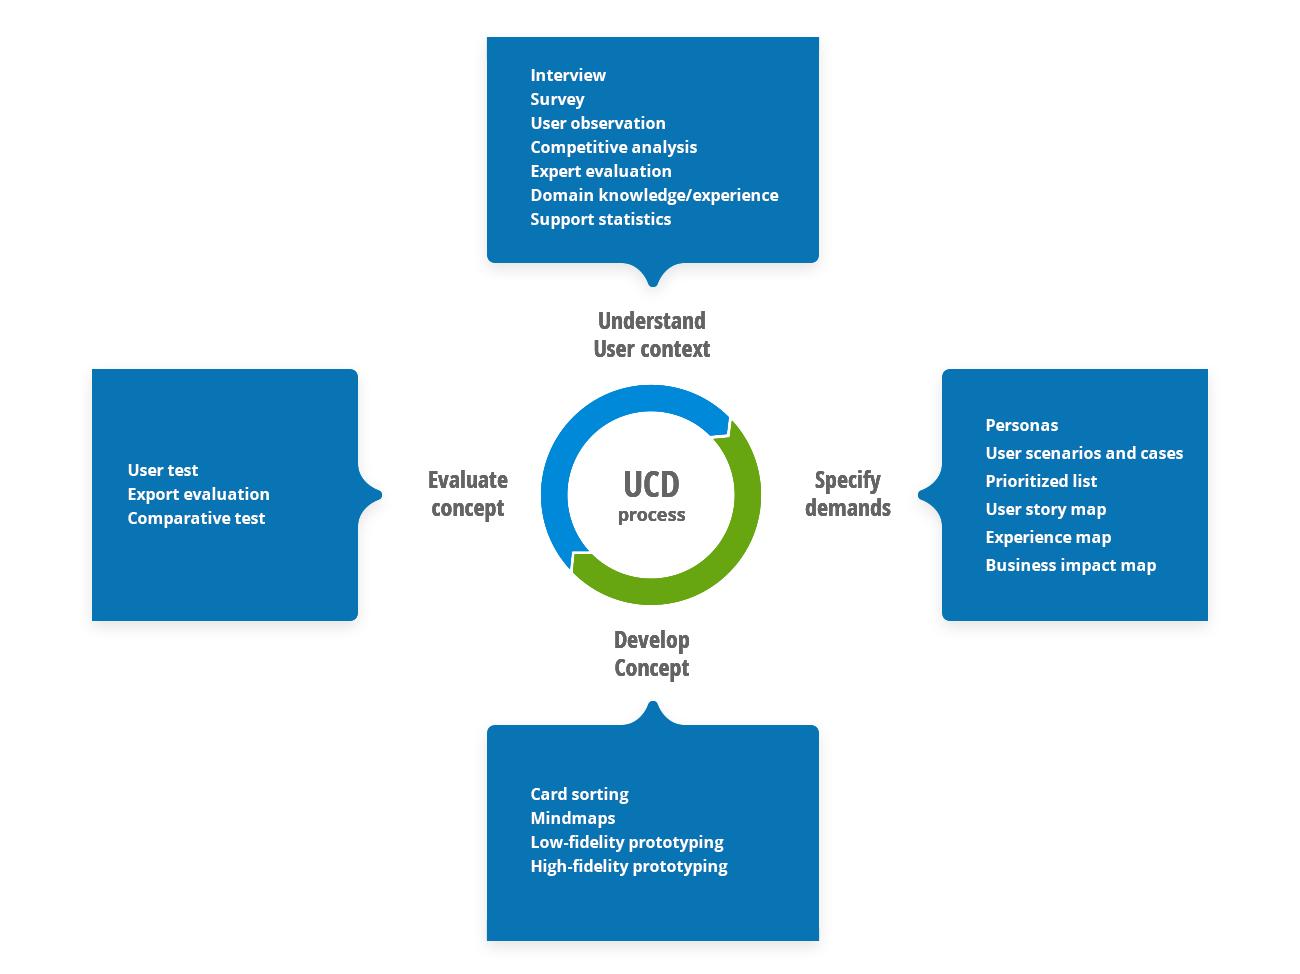 Illustration of the UCD process